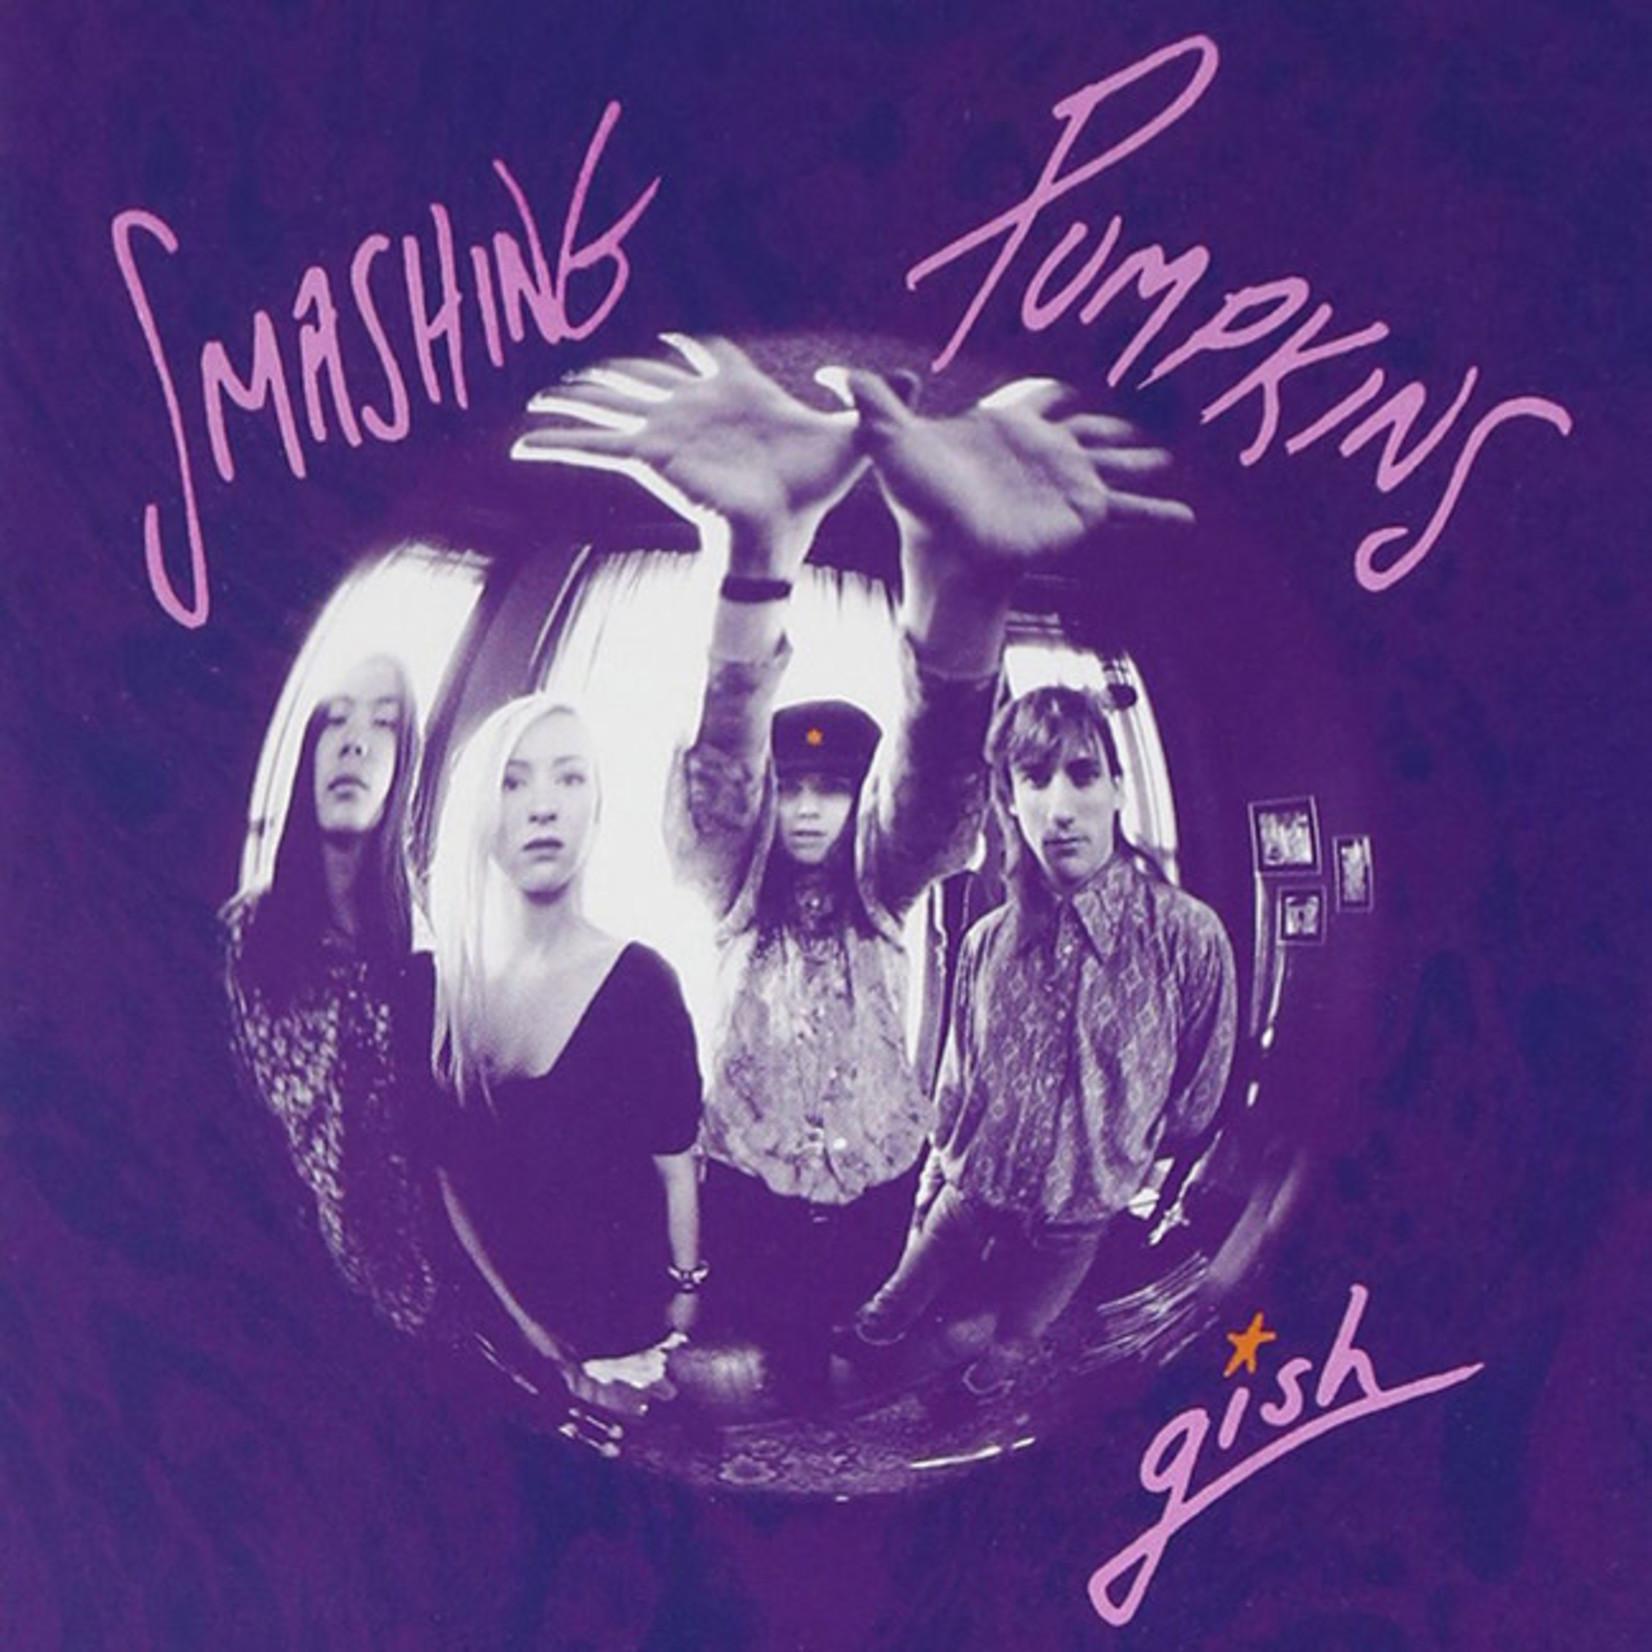 [New] Smashing Pumpkins: Gish